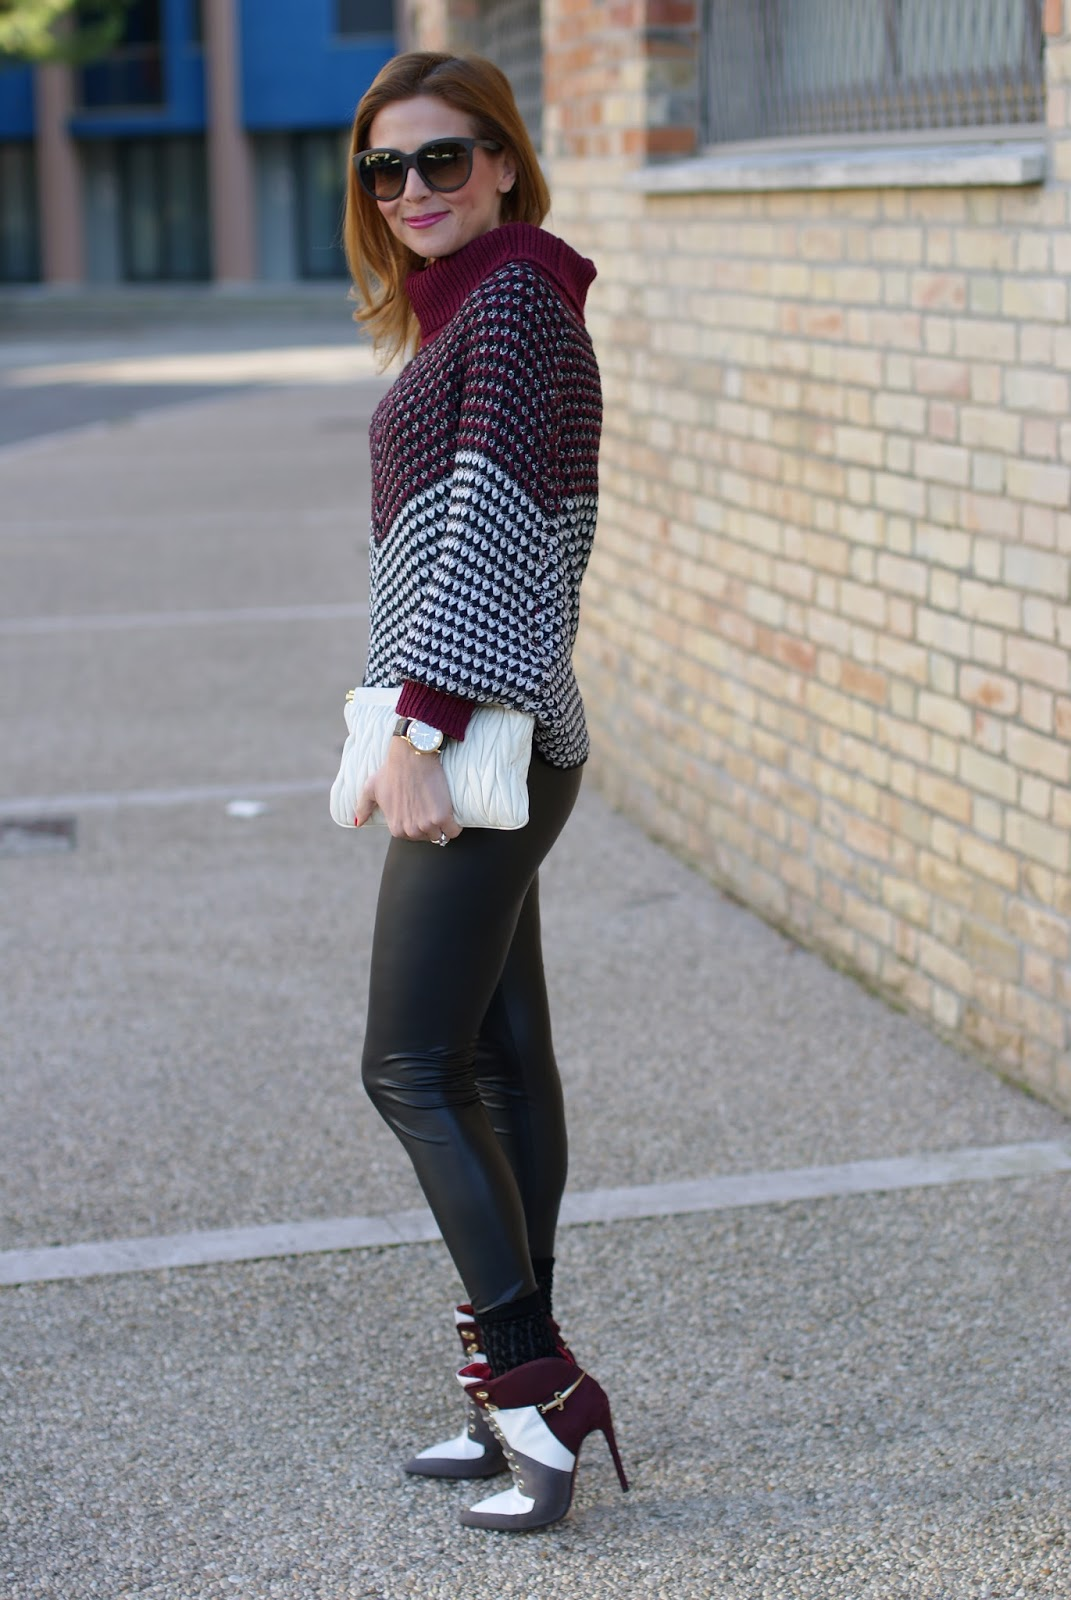 how to wear leather leggings, Jadea leggings, leather leggings and Smash! Prolix sweater on Fashion and Cookies fashion blog, fashion blogger style